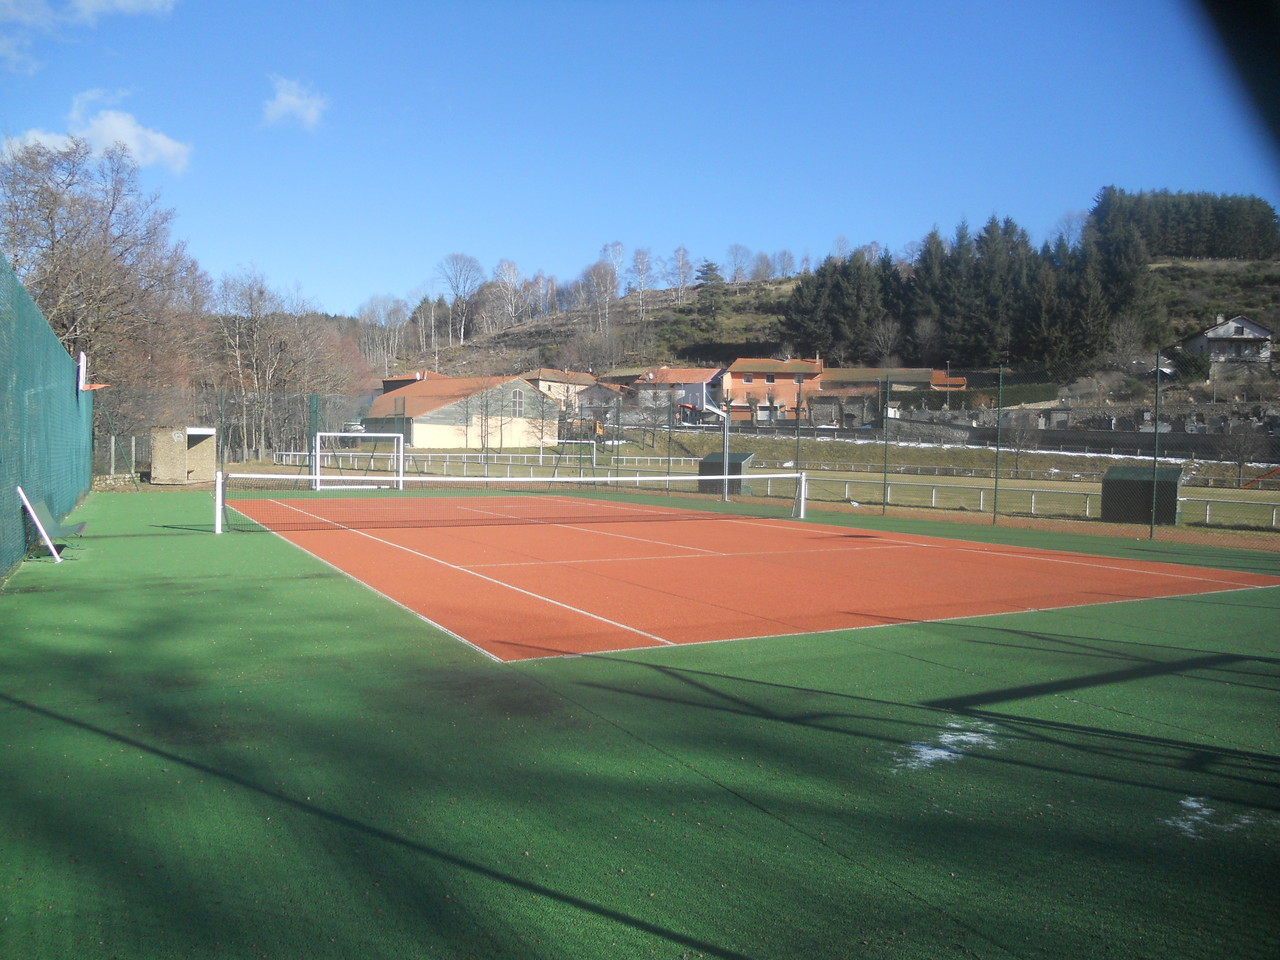 Terrain de tennis et basket